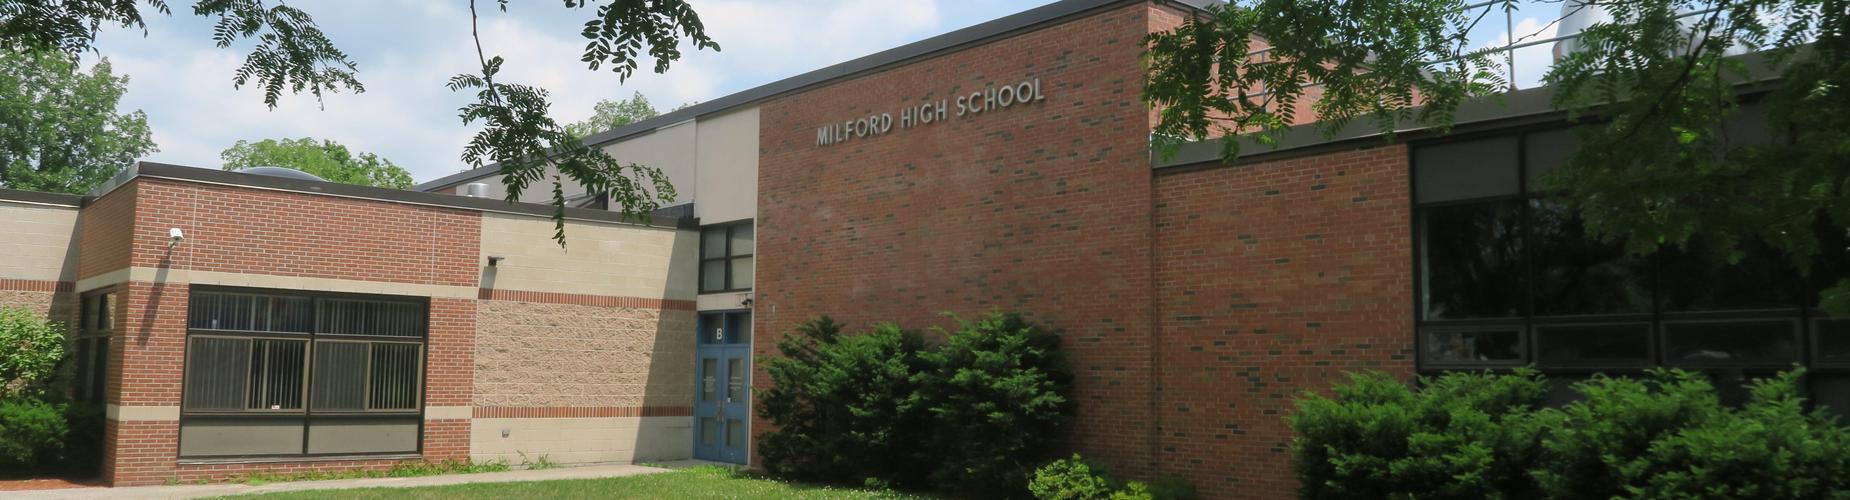 Milford High School Building by John Phelan